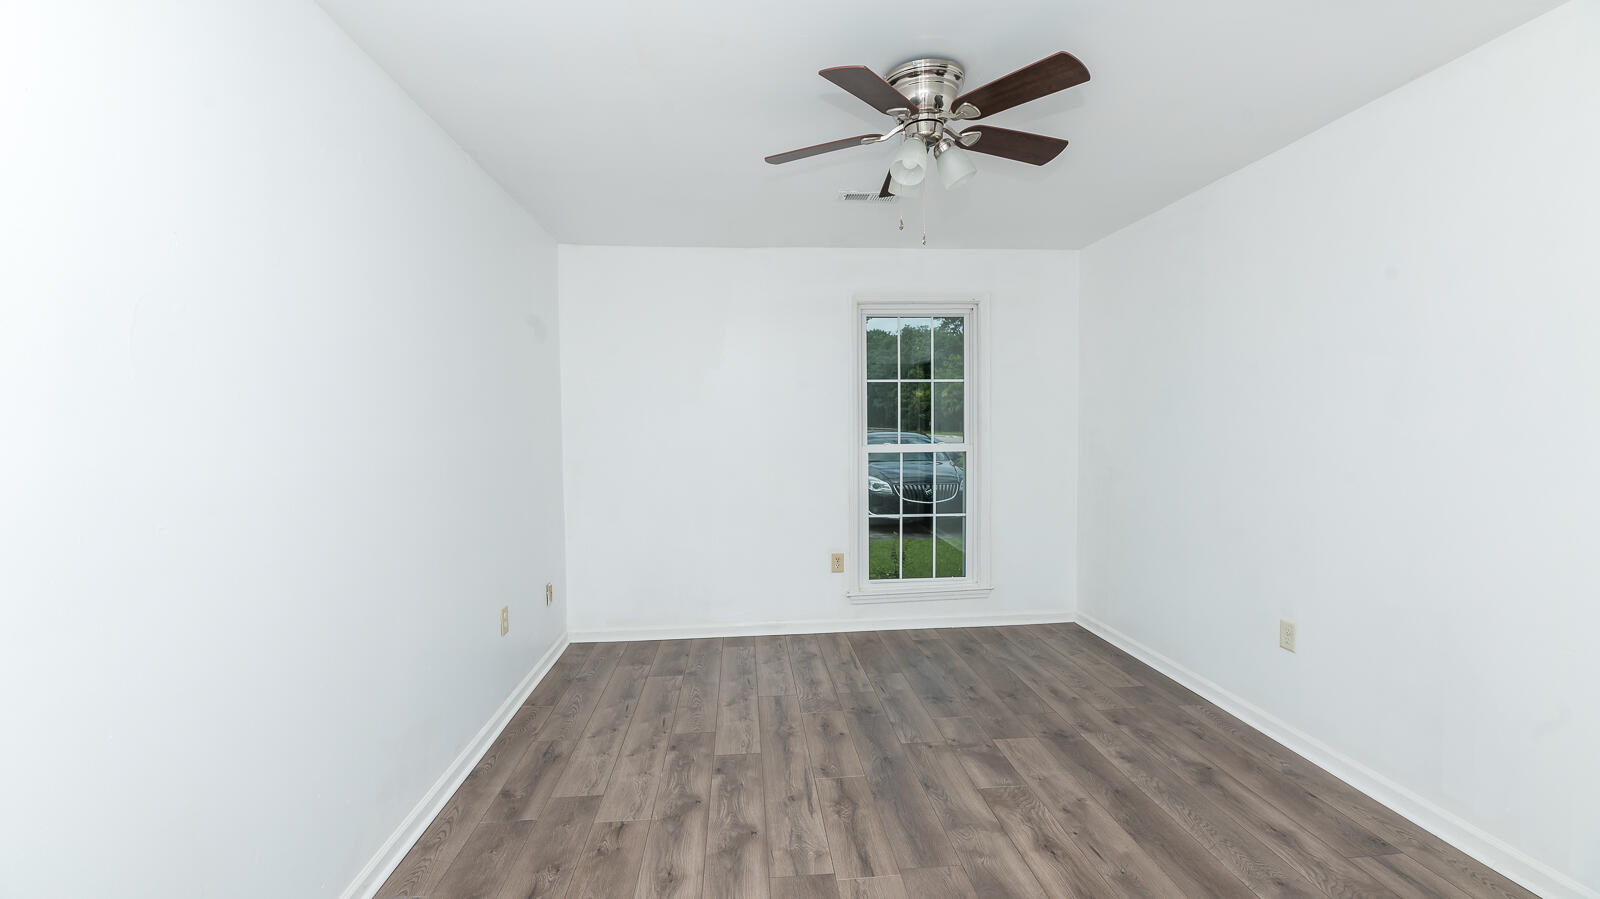 Ashley Villas Homes For Sale - 4315 Briarstone, North Charleston, SC - 2